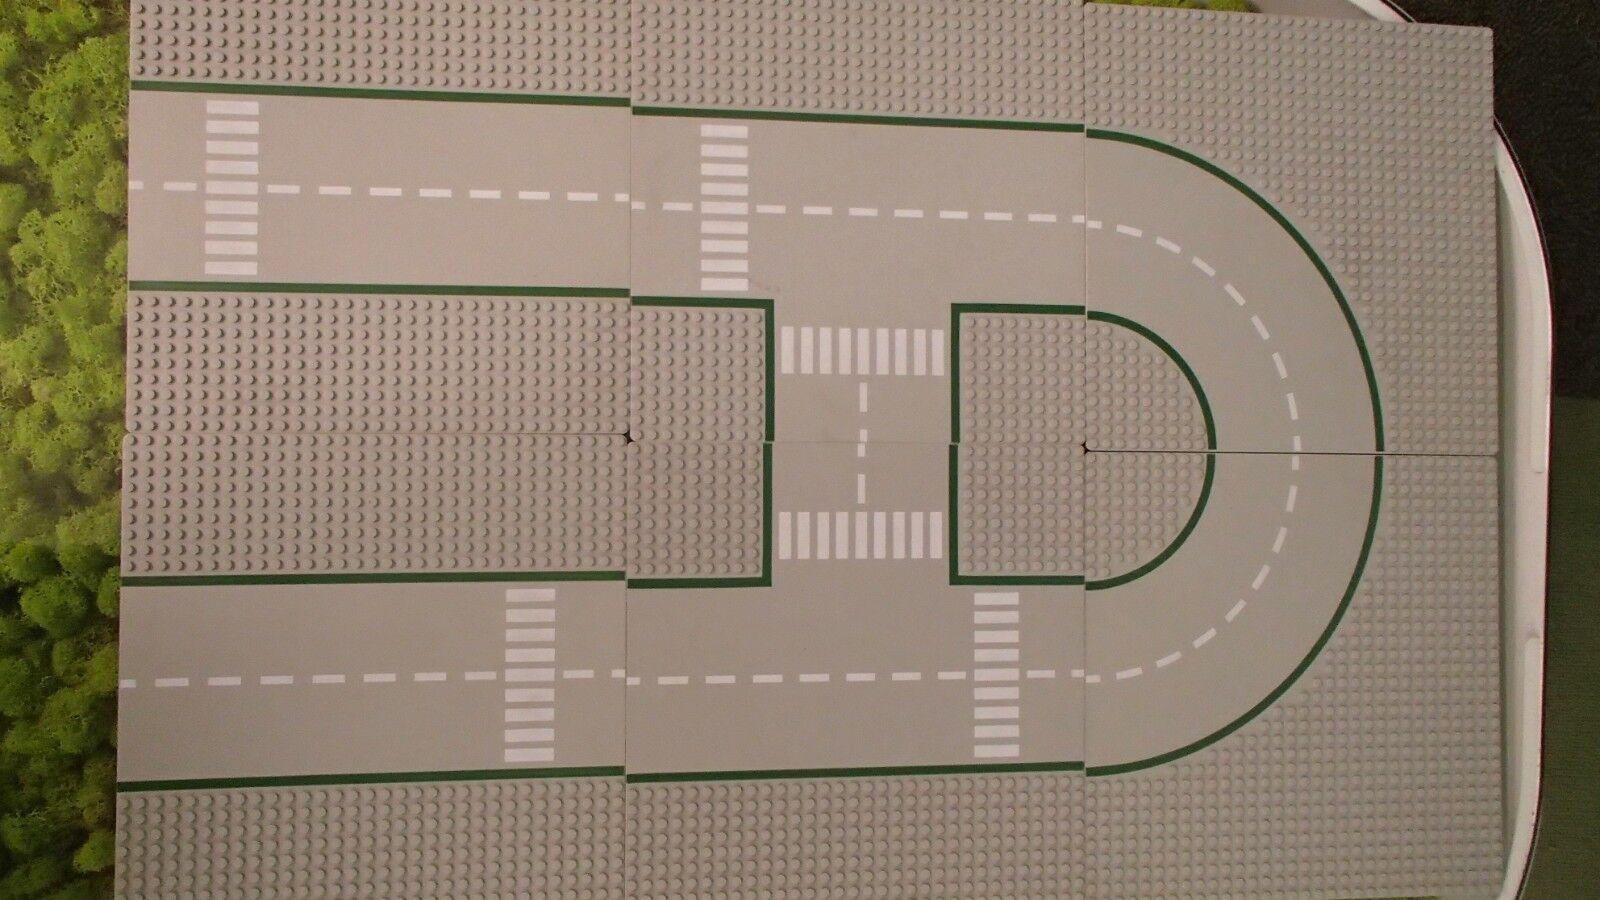 LEGO LEGOLAND 6 PIASTRE STRADE CITY città set 300 301 302 dritti curve incroci